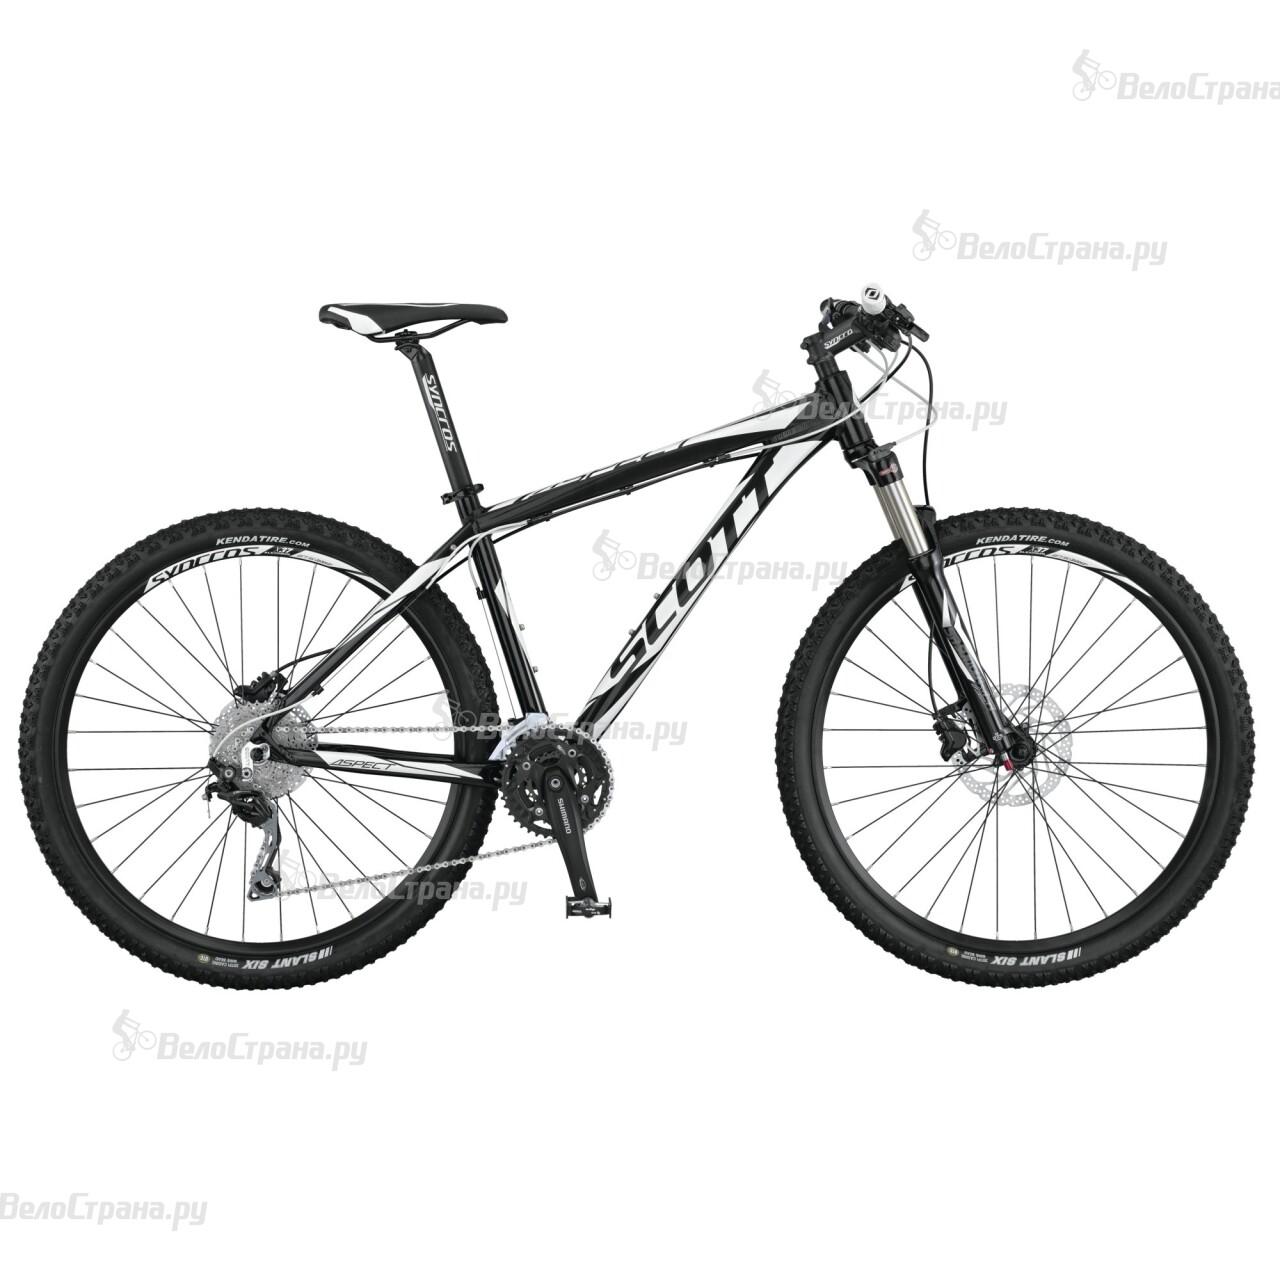 Велосипед Scott Aspect 720 (2015)  велосипед scott aspect 660 2015